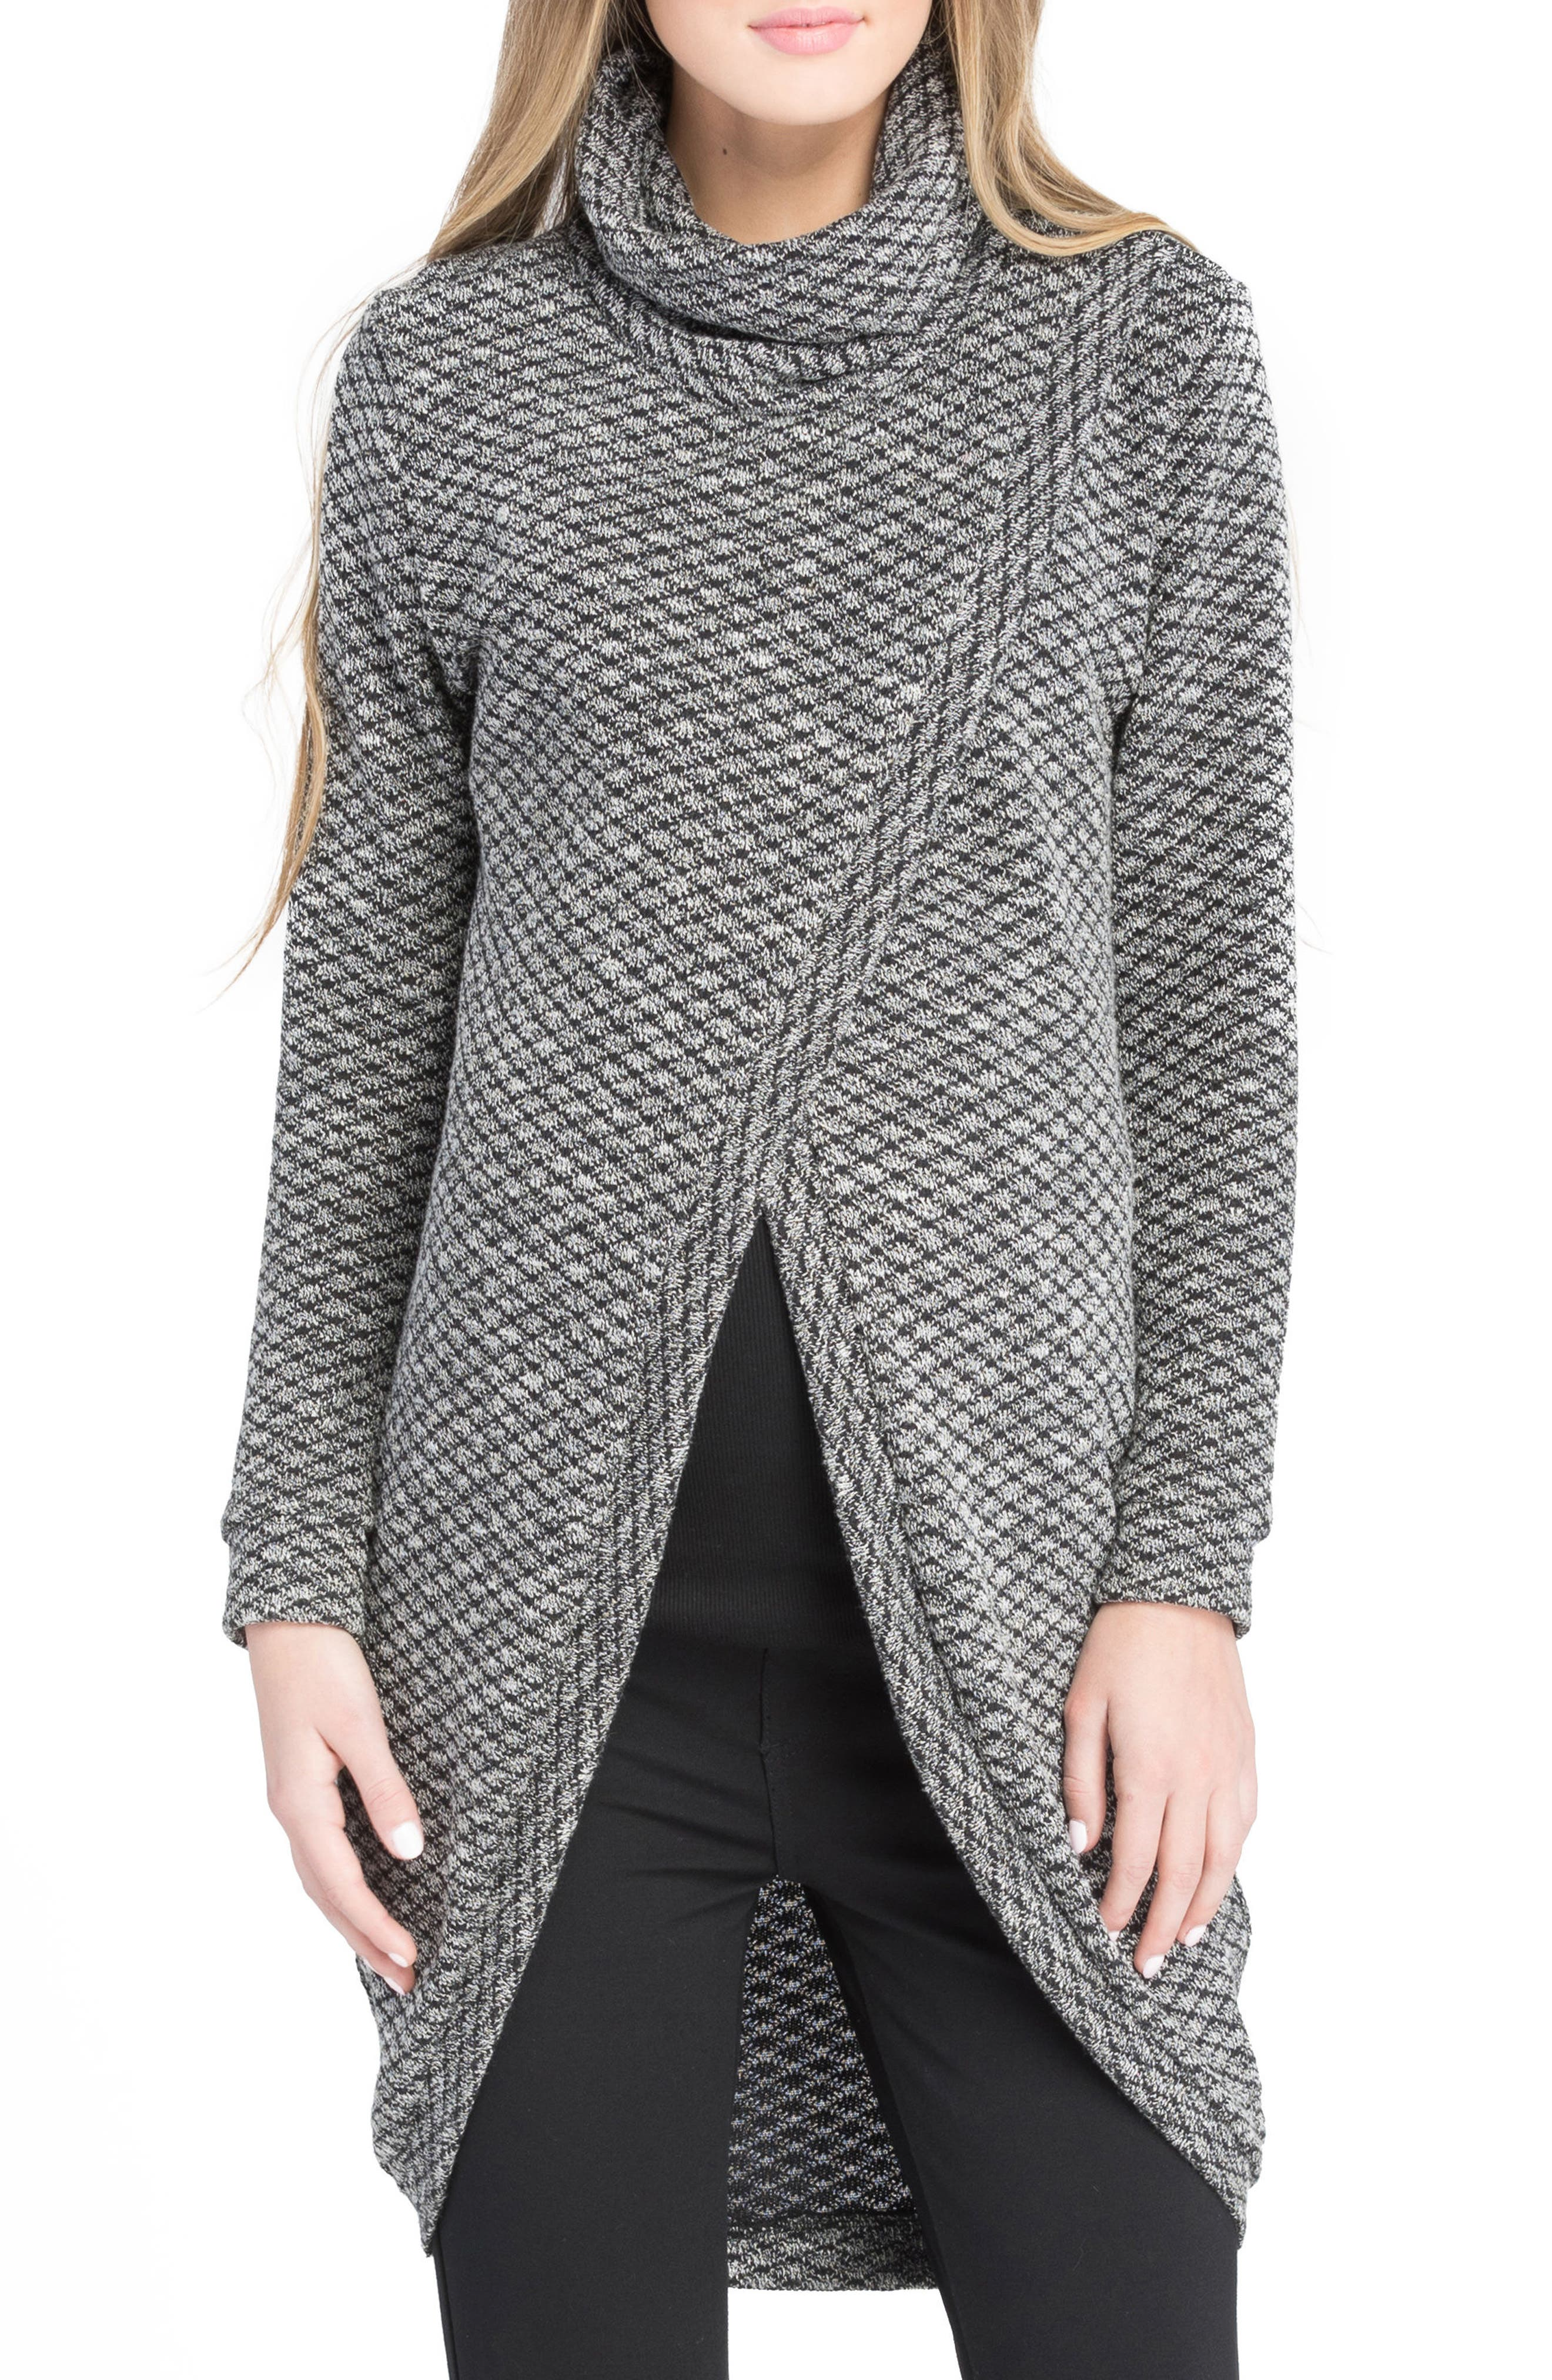 Nursing Tunic Sweater,                         Main,                         color, Black